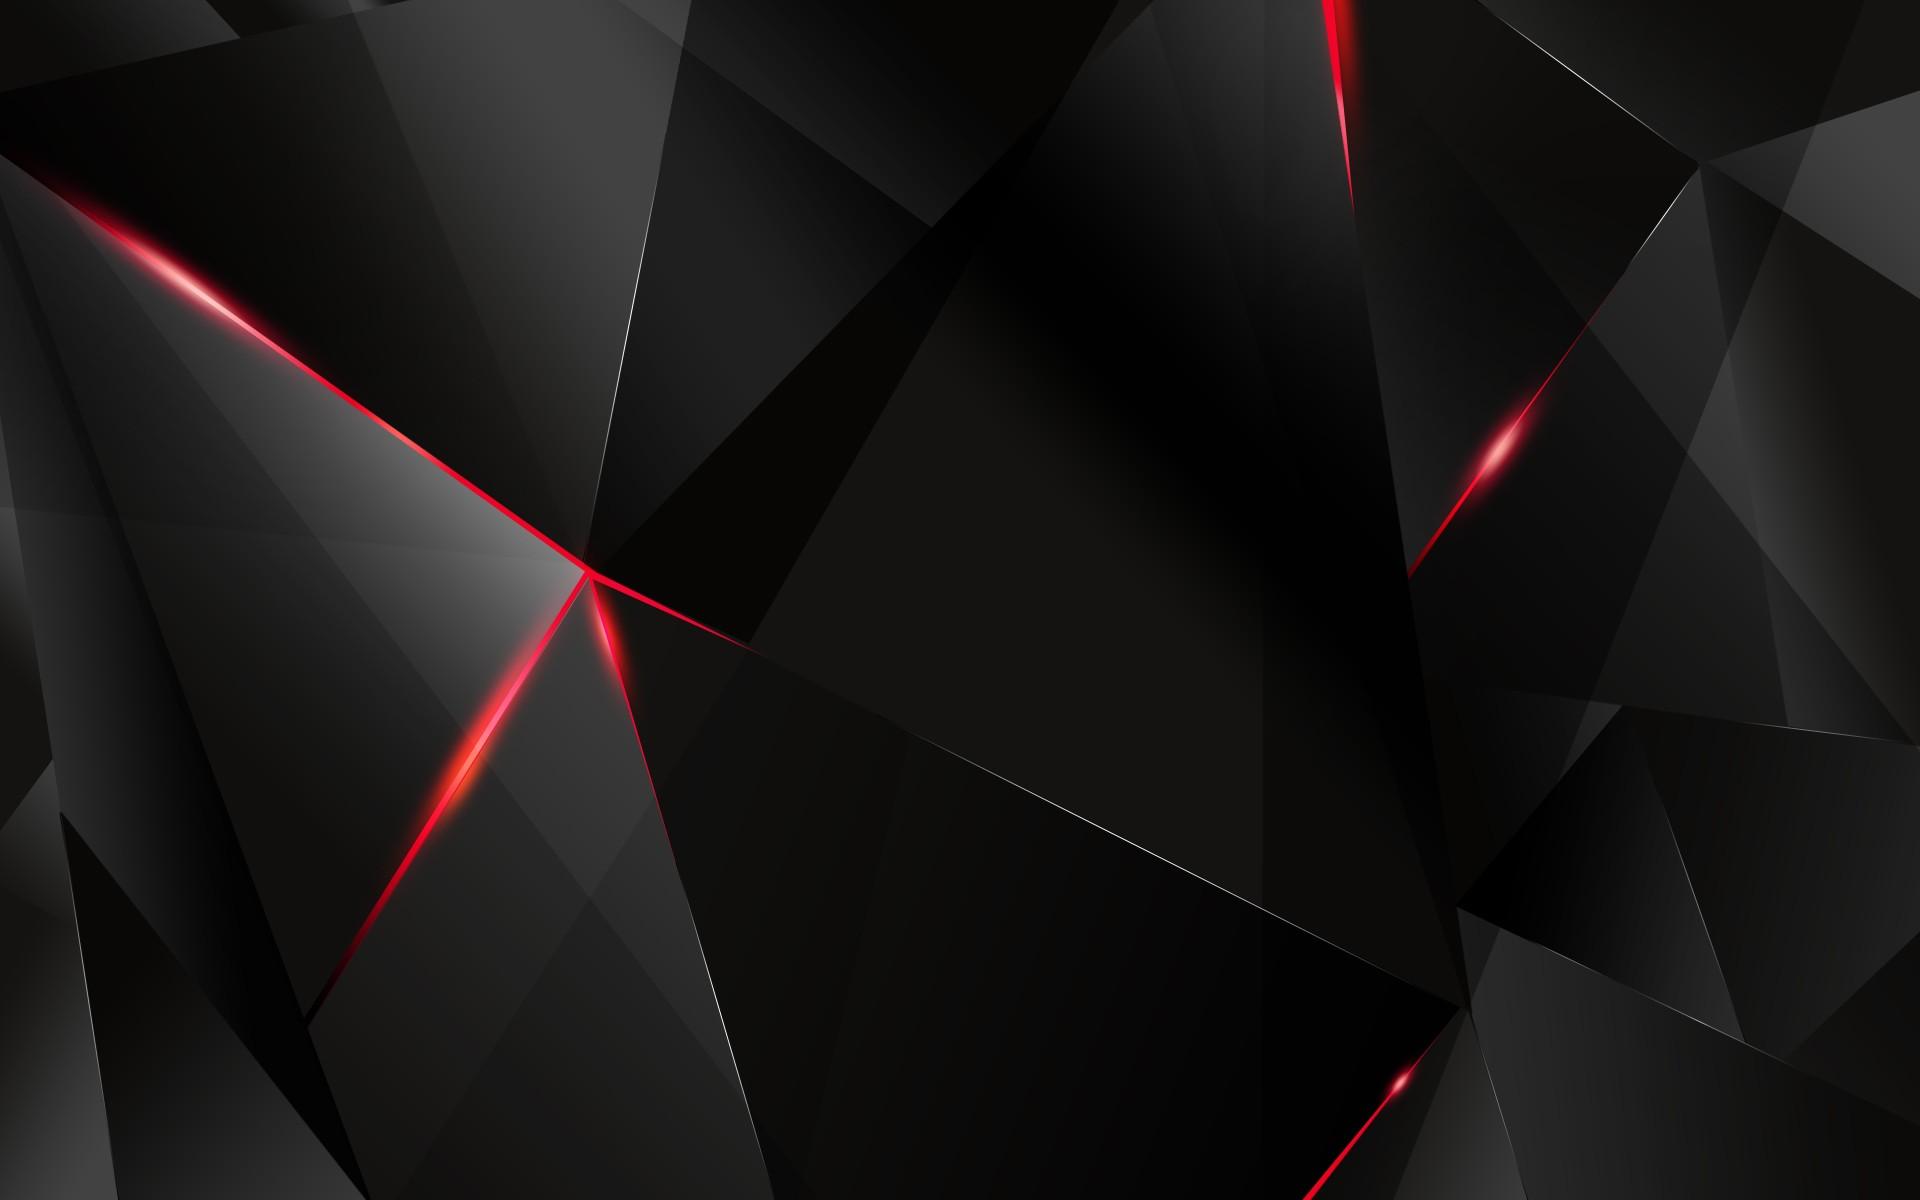 Black Digital Art Monochrome Dark Abstract Red Symmetry Triangle Geometry Texture Circle Textured Light Wheel Shape